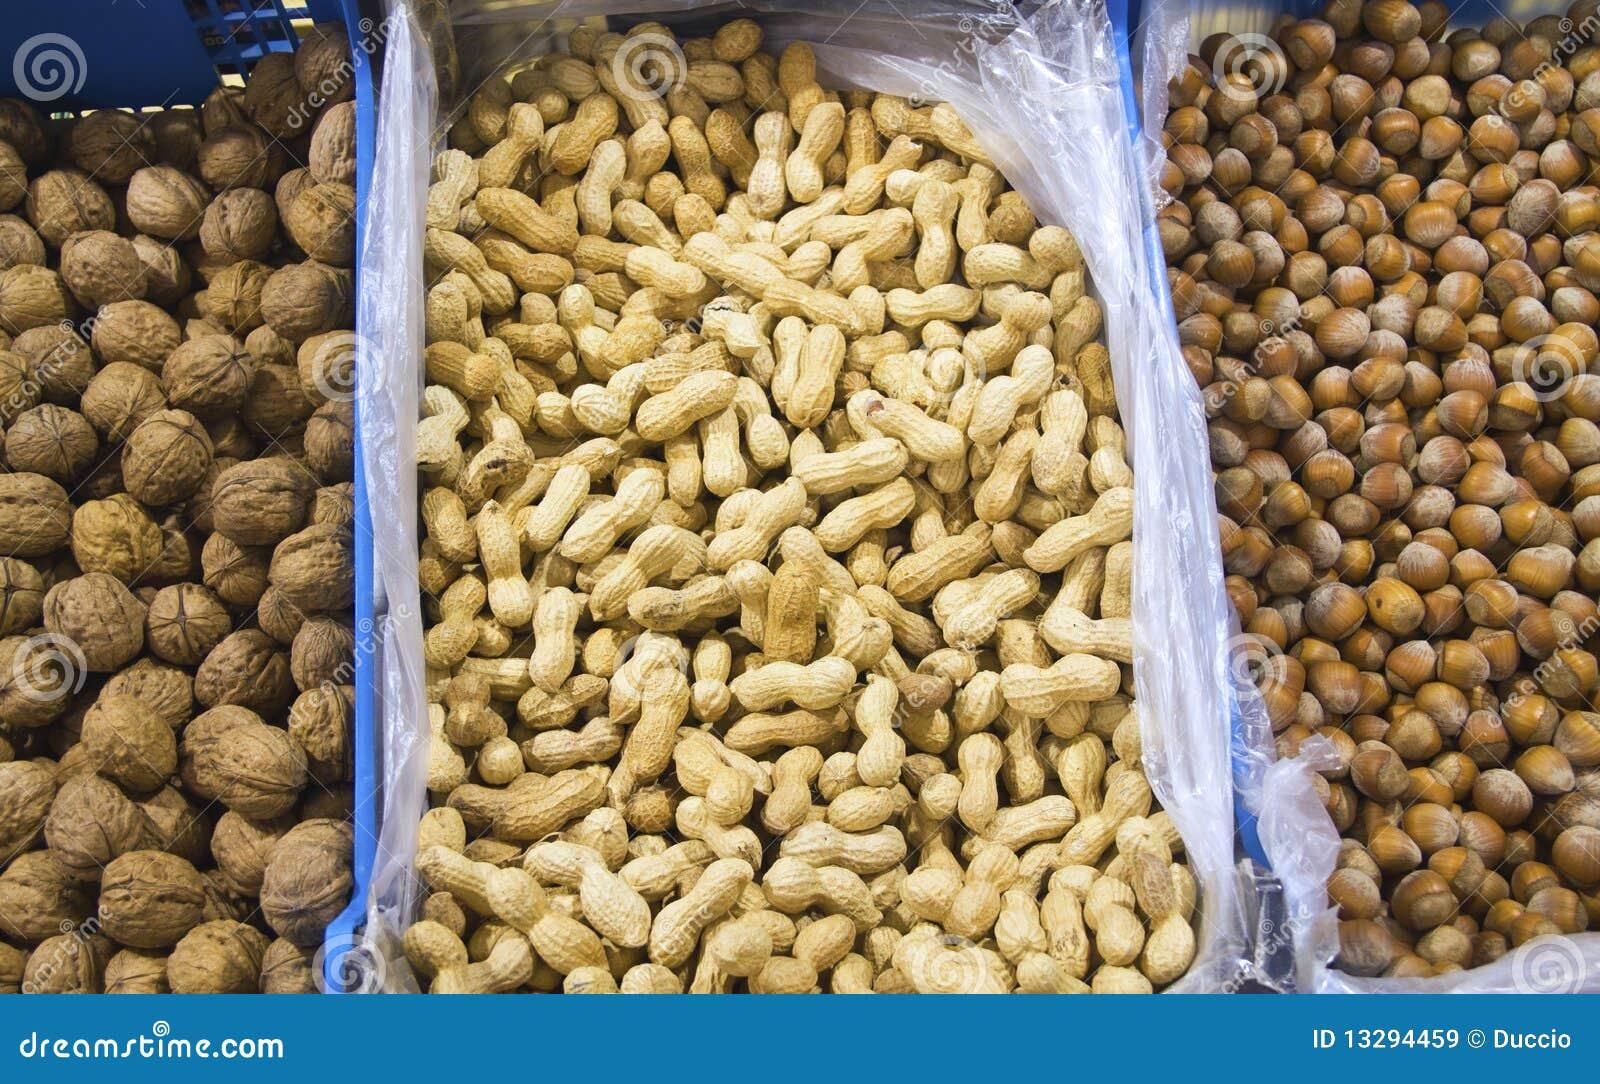 Avelã e amendoins